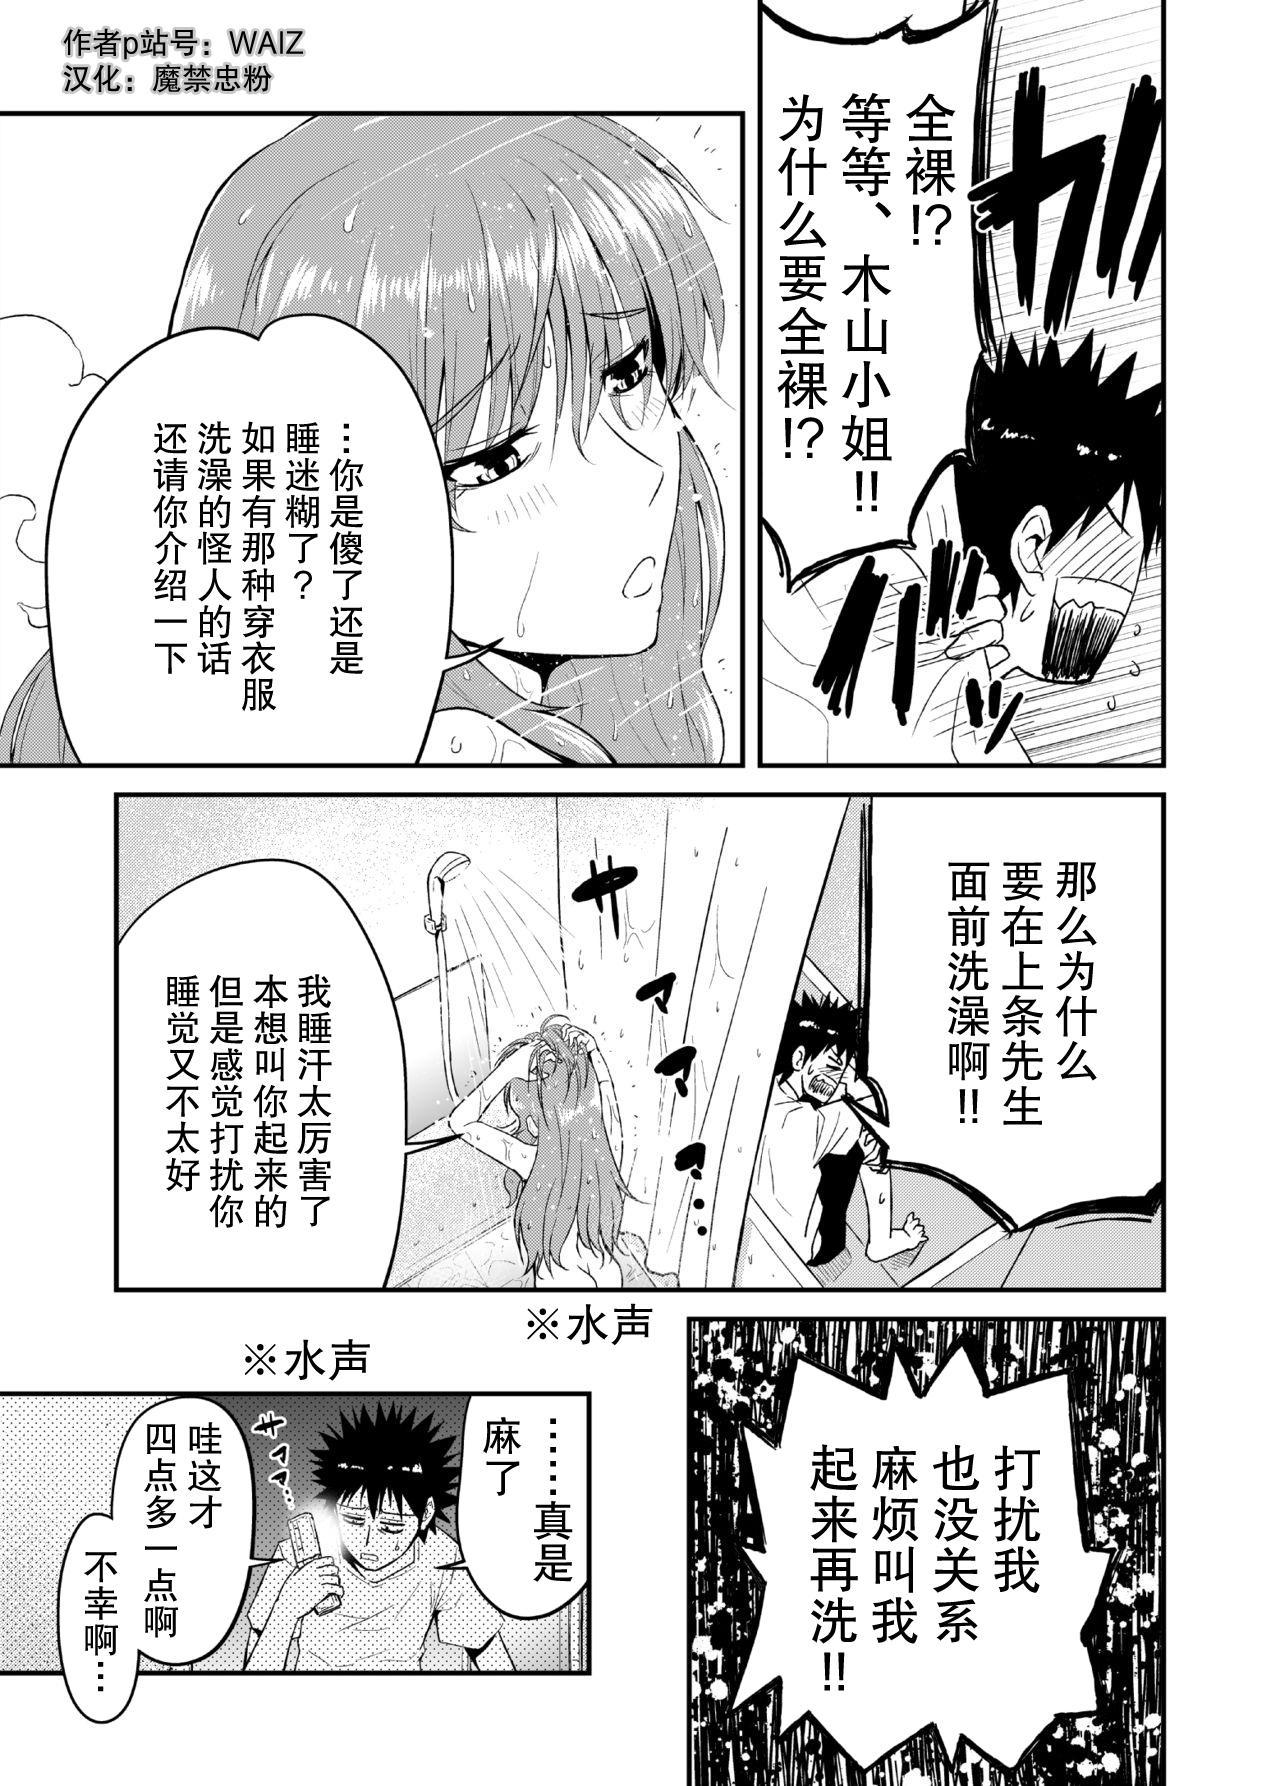 [WAIZ][同人个人渣汉化][就算是上条先生我家要住7个人还是太勉强了](Toaru Majutsu no Index) [中国翻译] 40